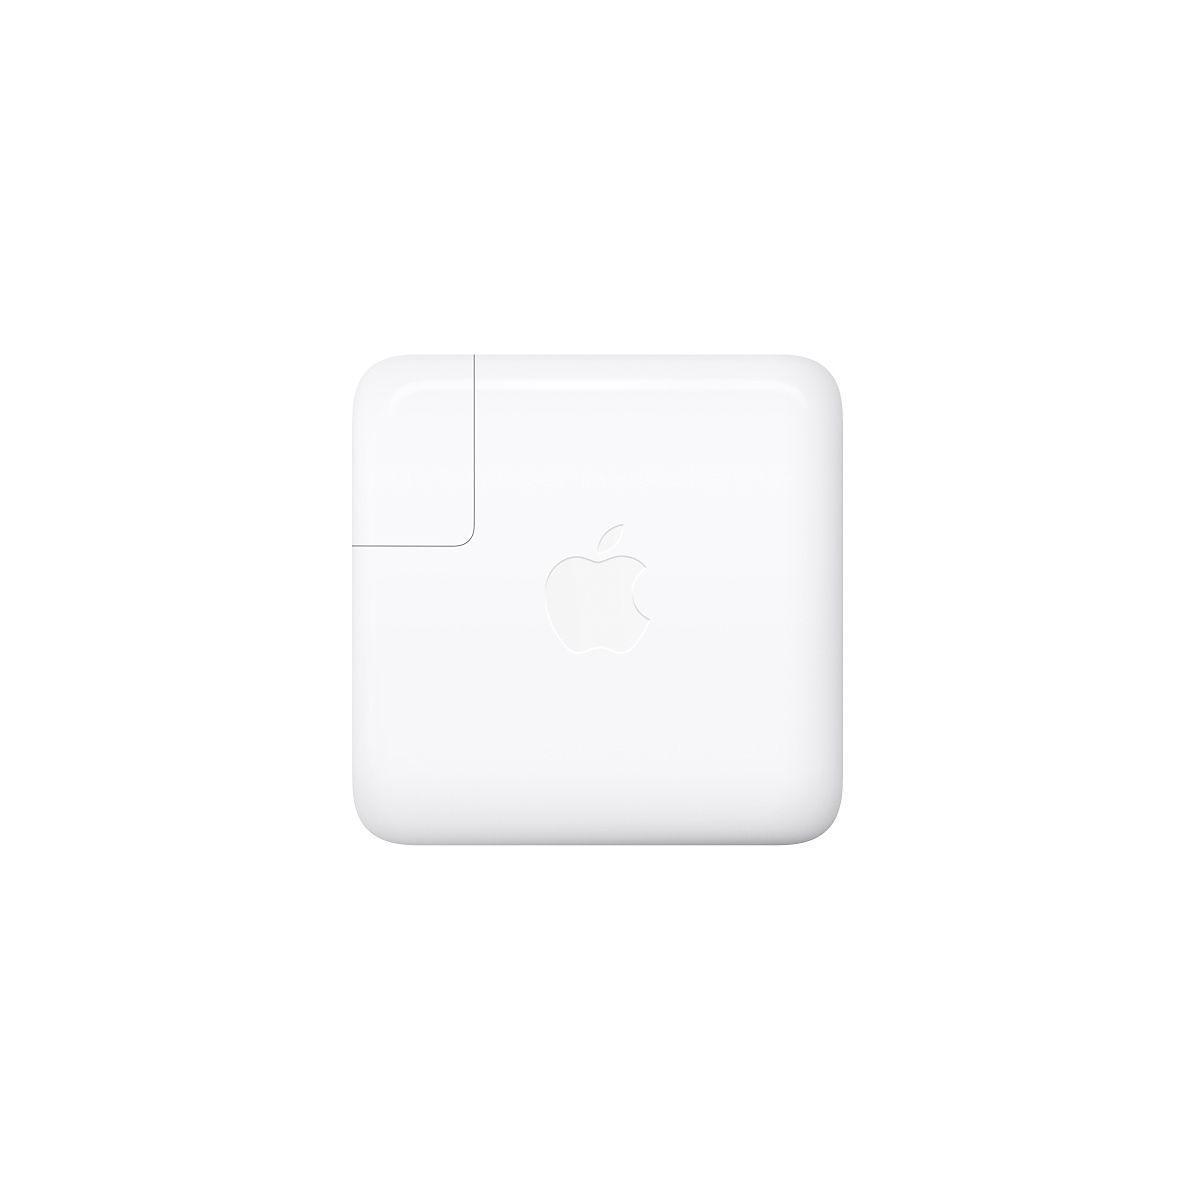 Alim apple usb-c 61w pour macbook pro 13